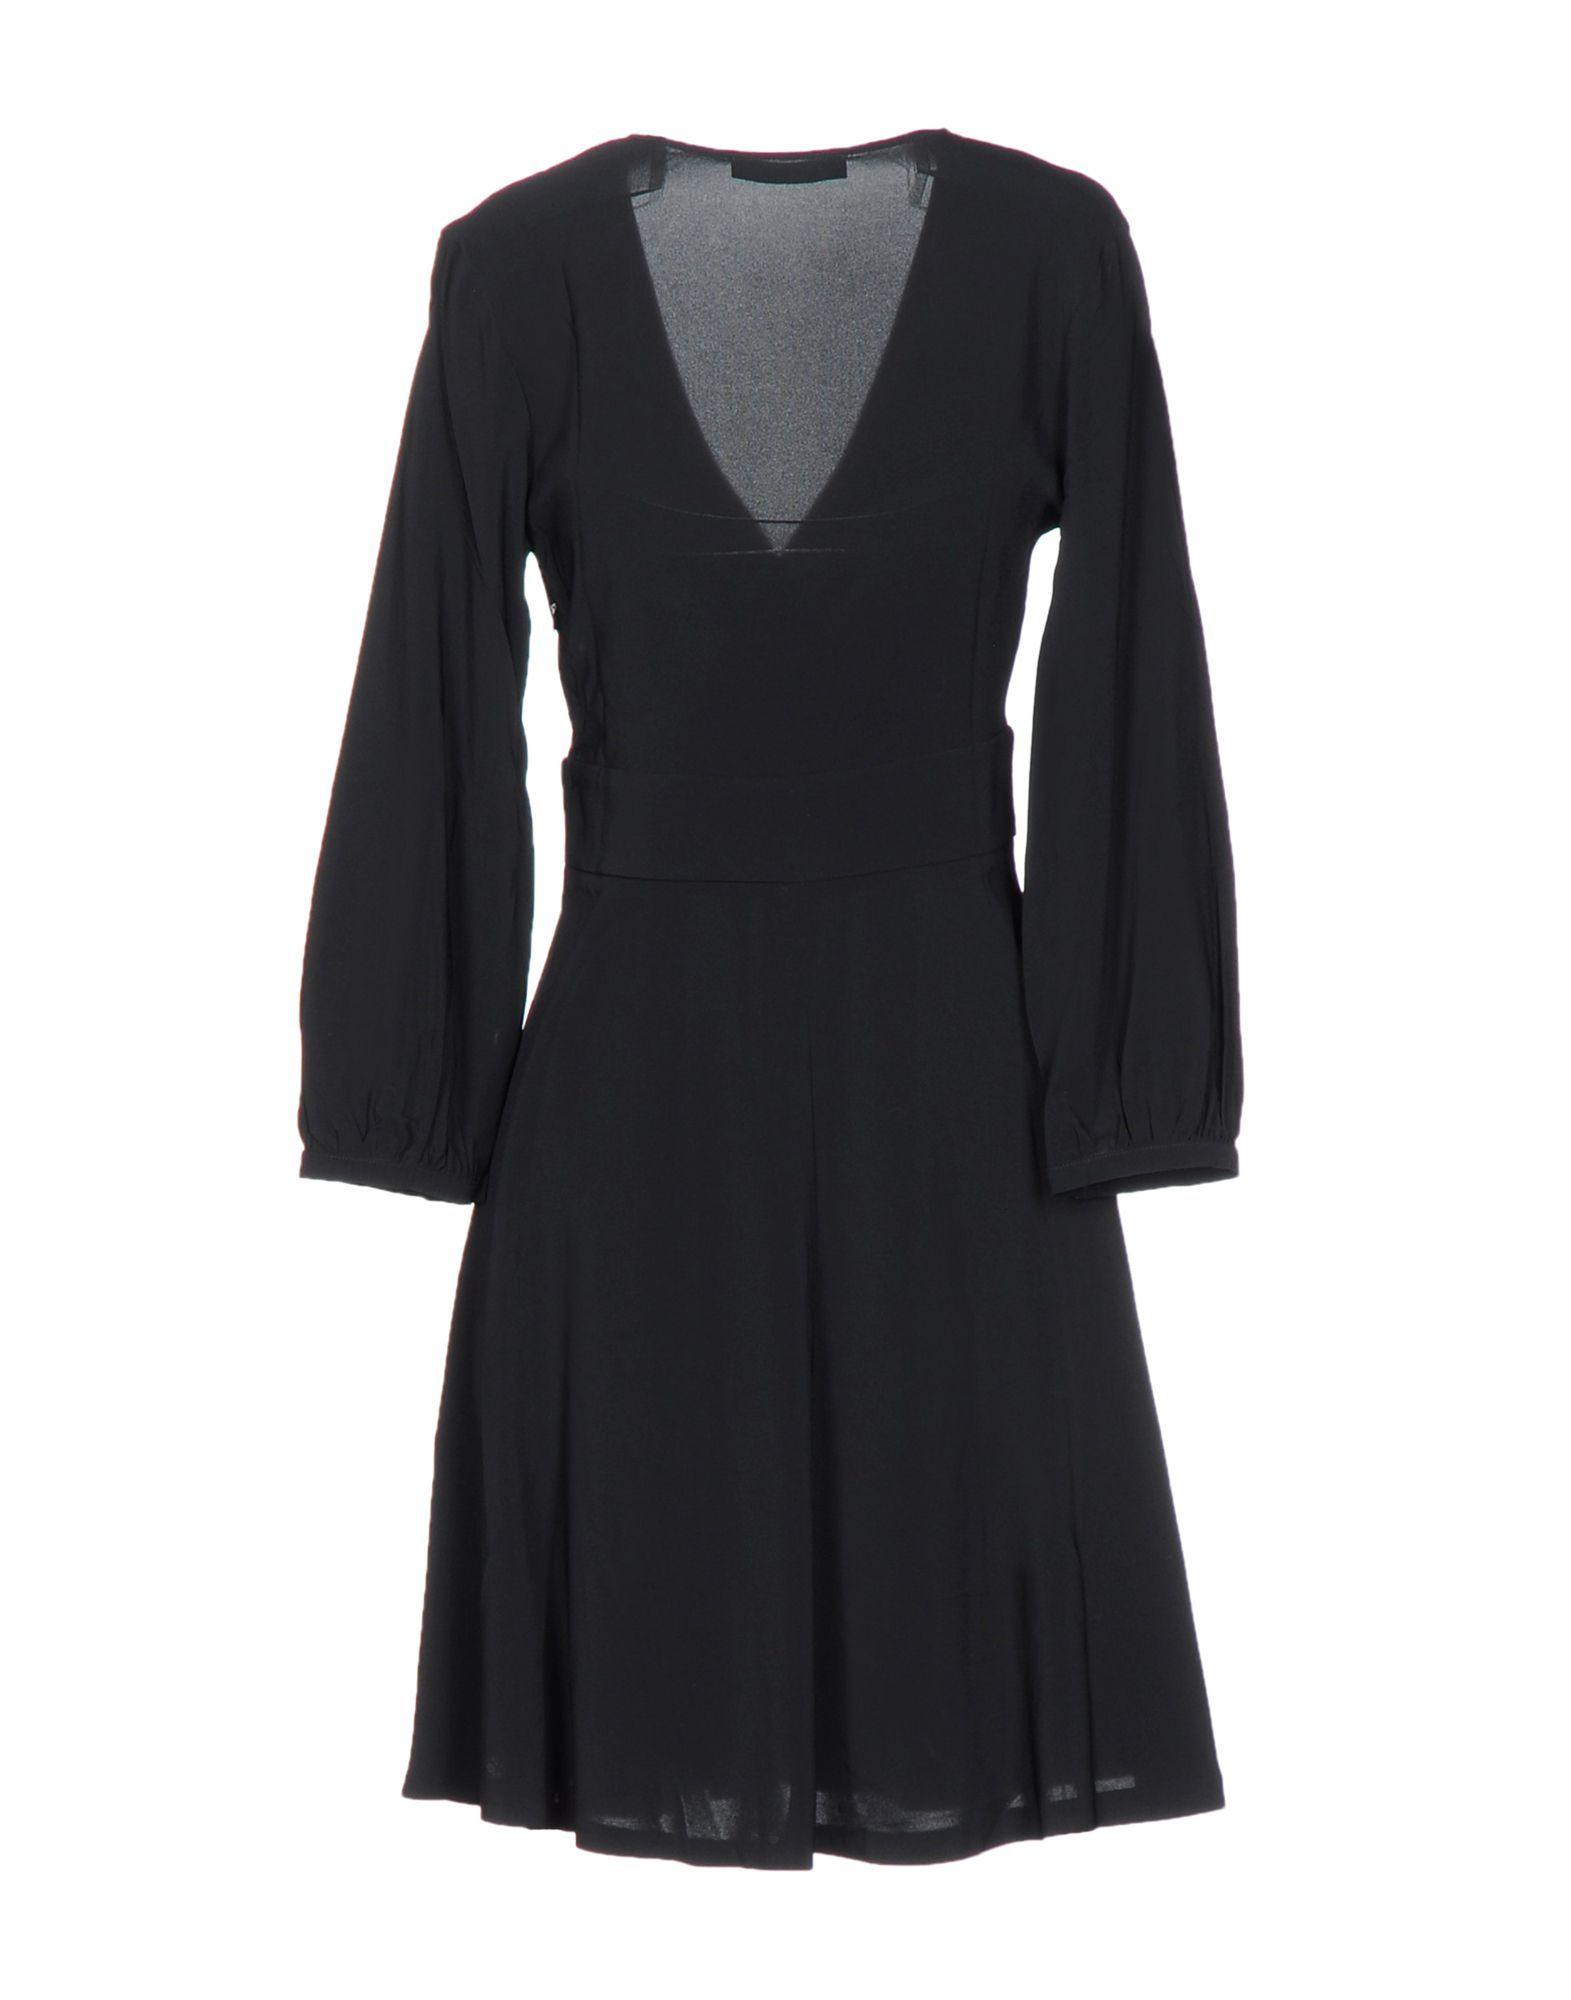 Dress .Tessa Black Women's Viscose